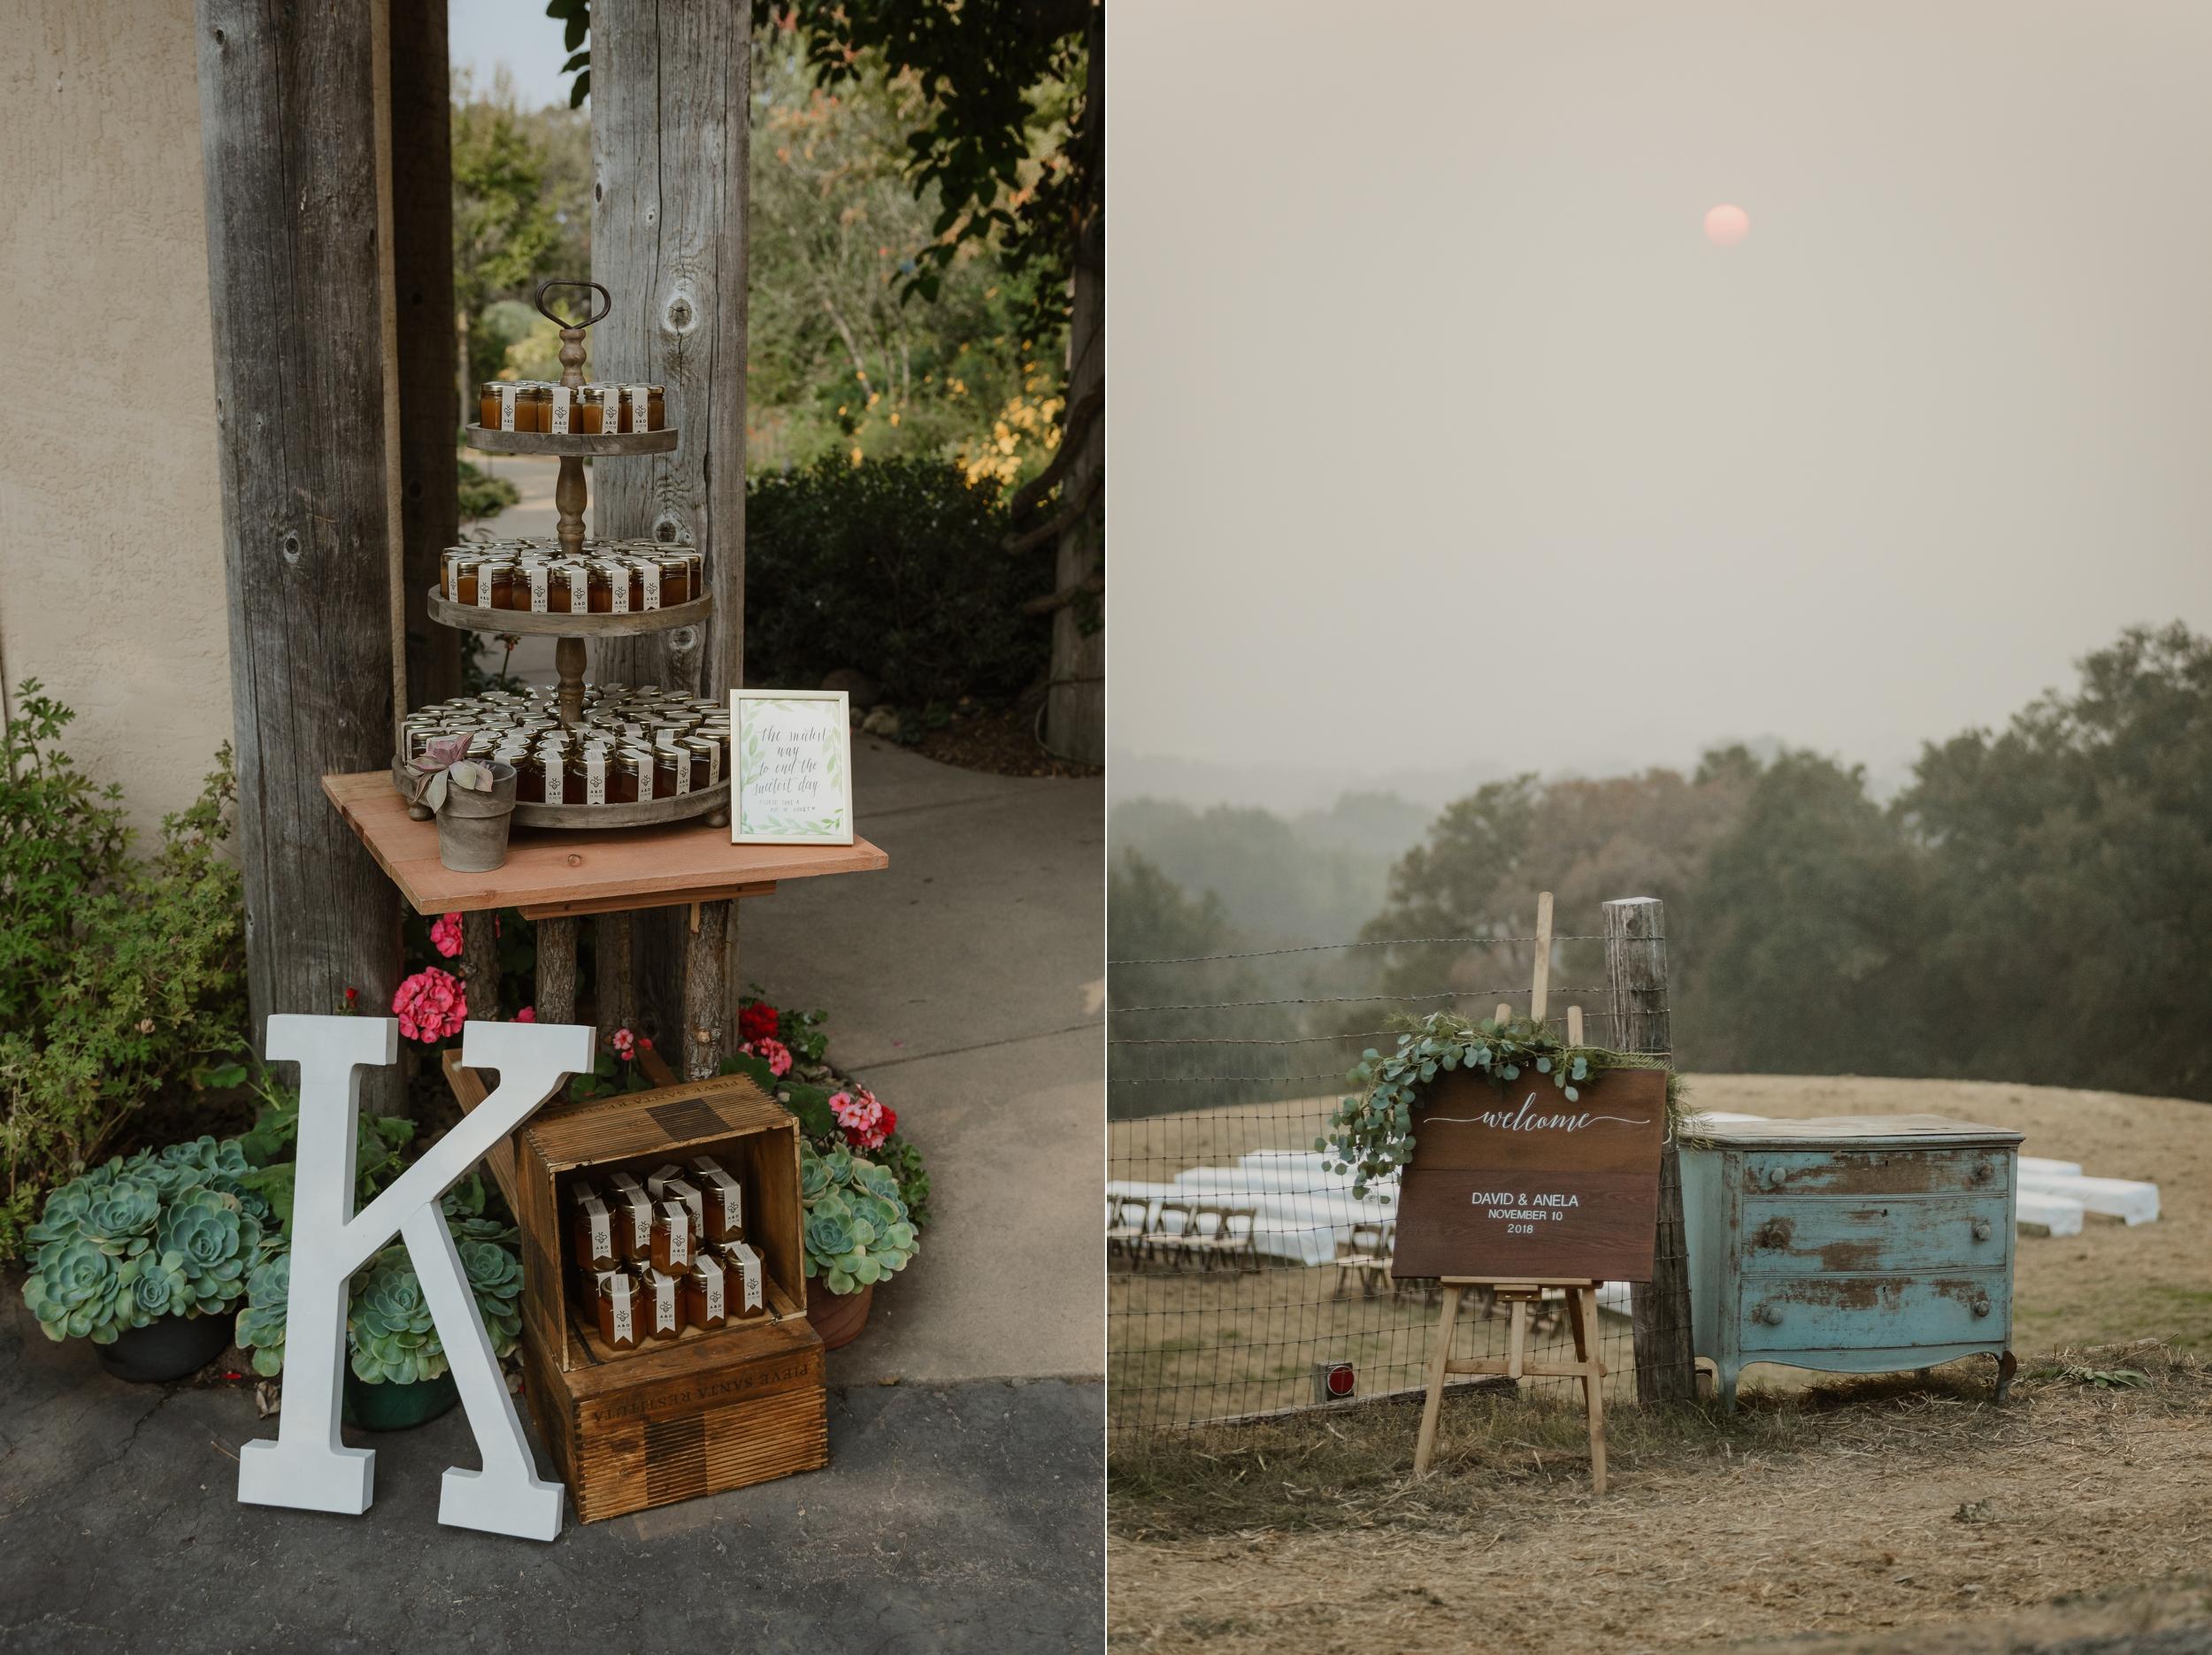 029marin-petaluma-backyard-wedding-vivianchen-031_WEB.jpg